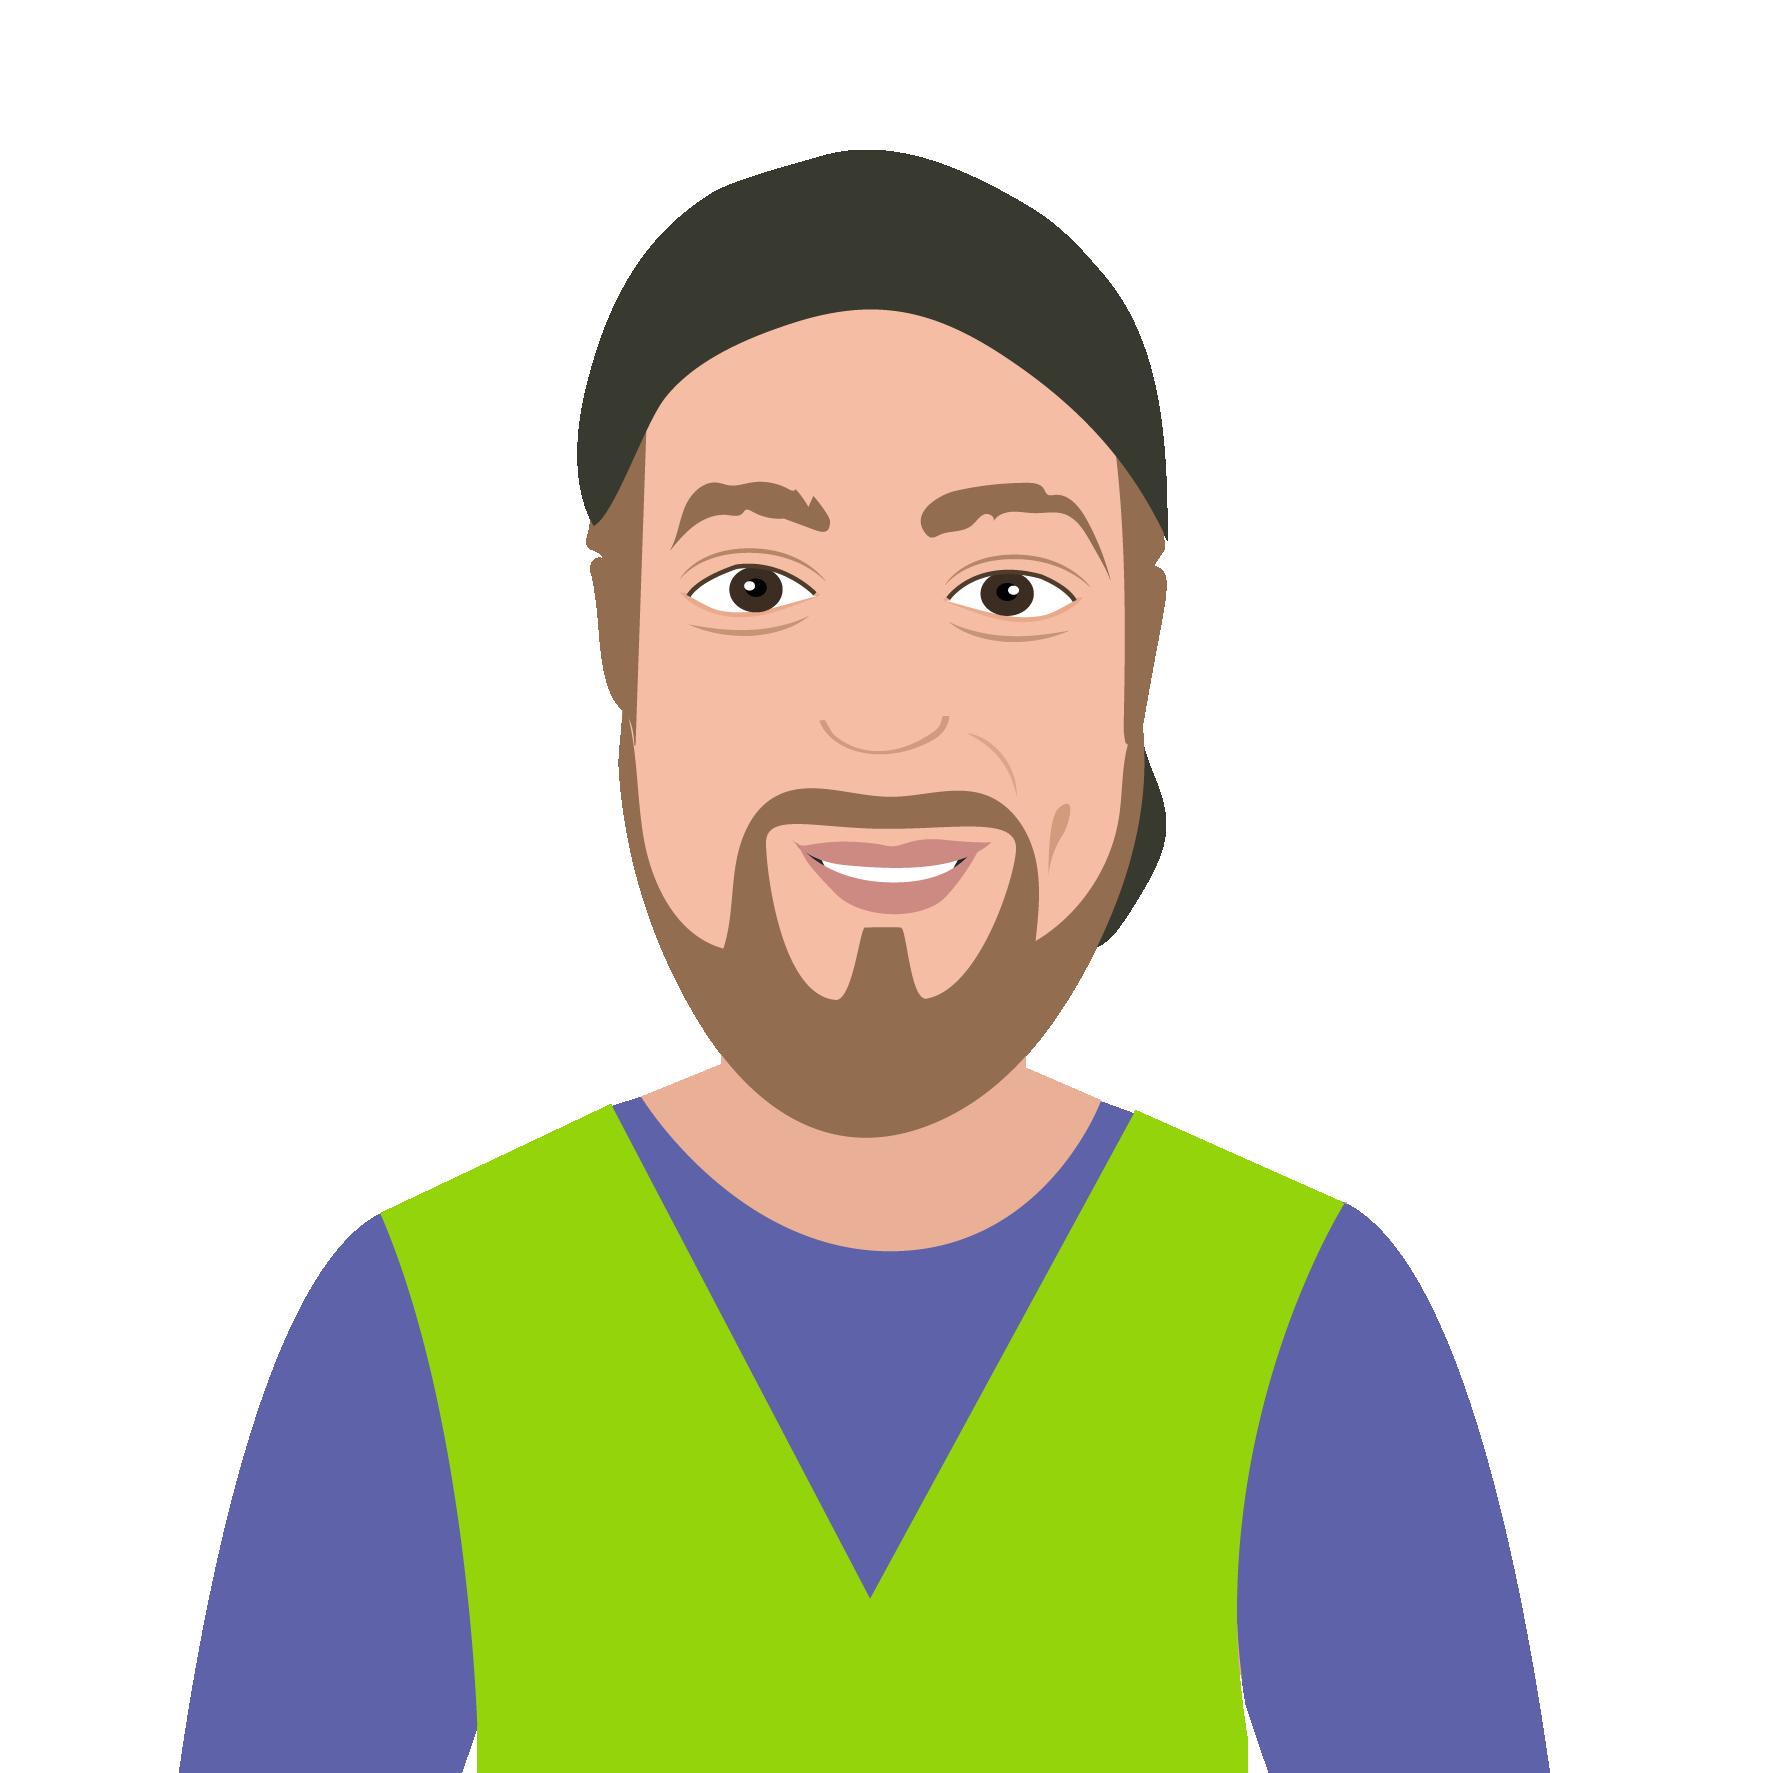 jaquier_habefast_illu_employes-1773x1773-site_Plan de travail 1 copie 12